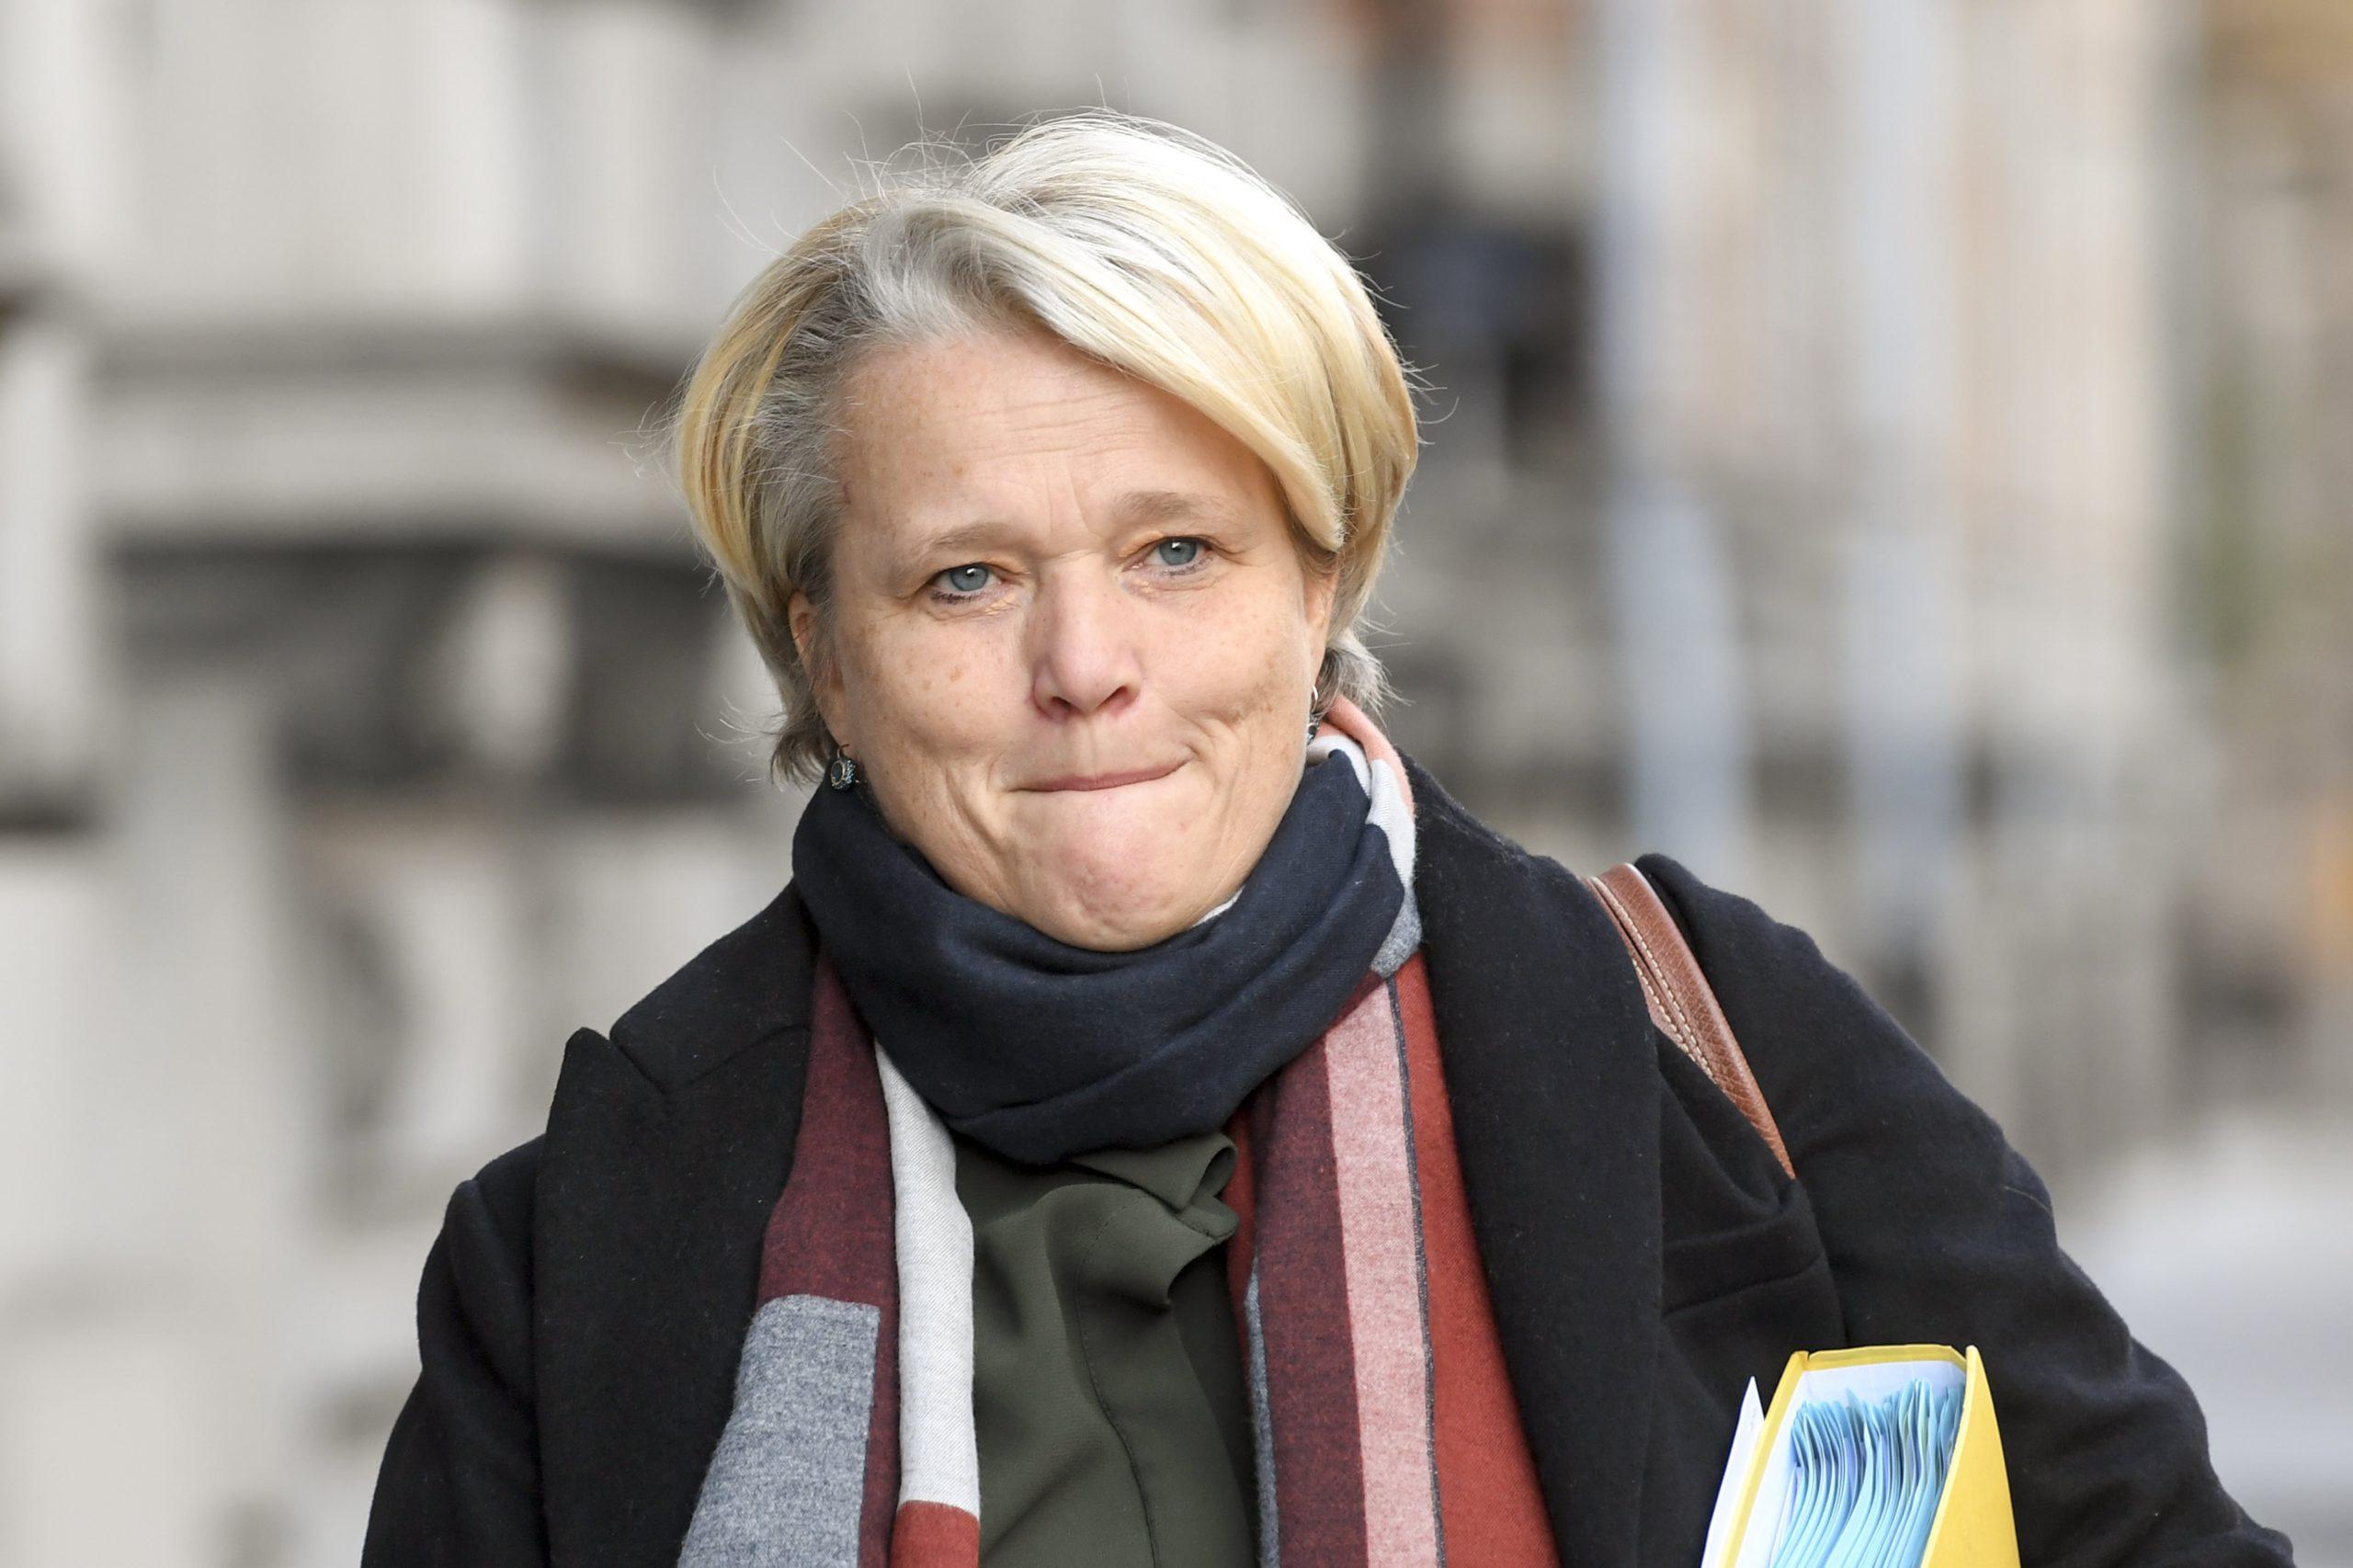 Nathalie Muylle is minister van Werk en Economie in de ontslagnemende federale regering. - Isopix